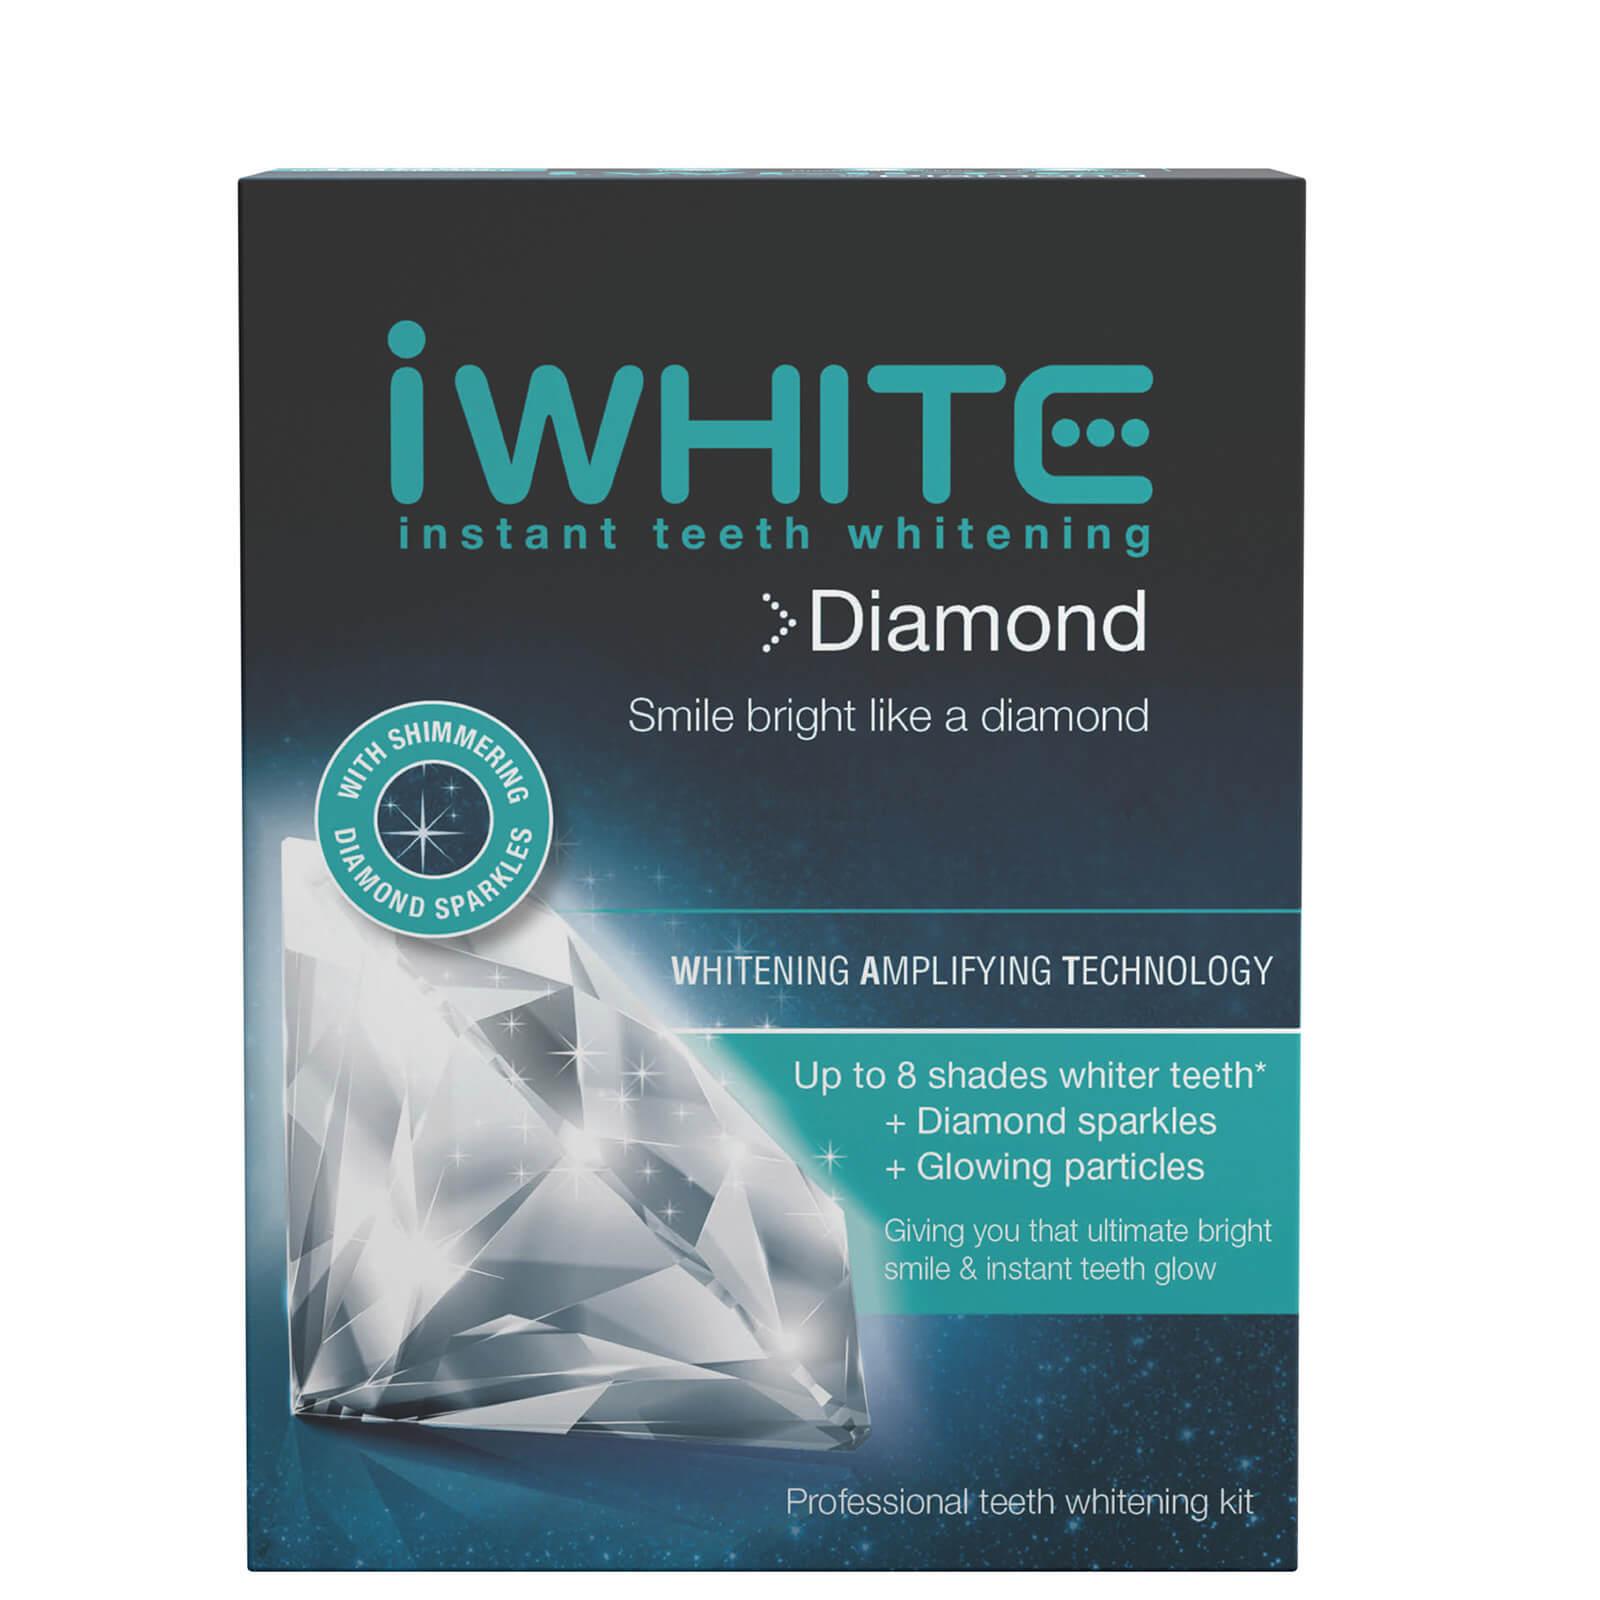 iWhite Diamond Whitening Kit - 10 Trays